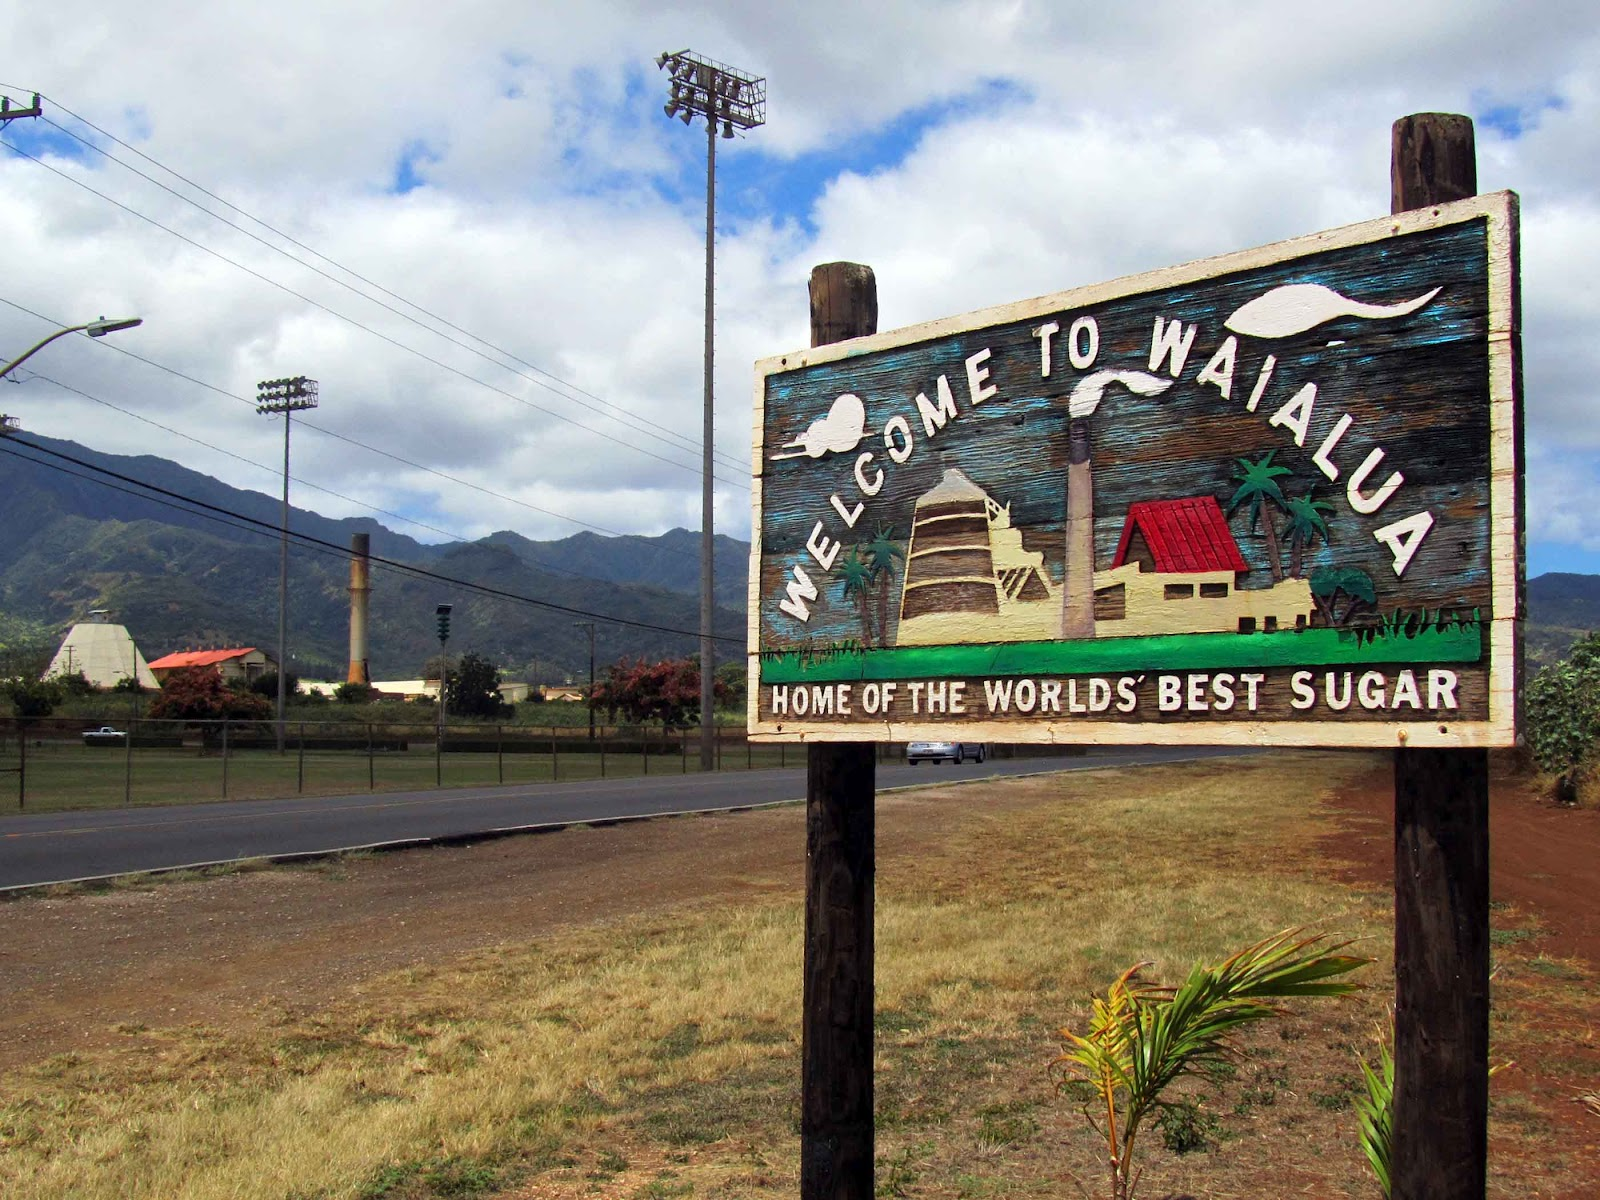 Source:http://geographicallyyourswelcome.blogspot.com/2012/08/waialua-hawaii.html